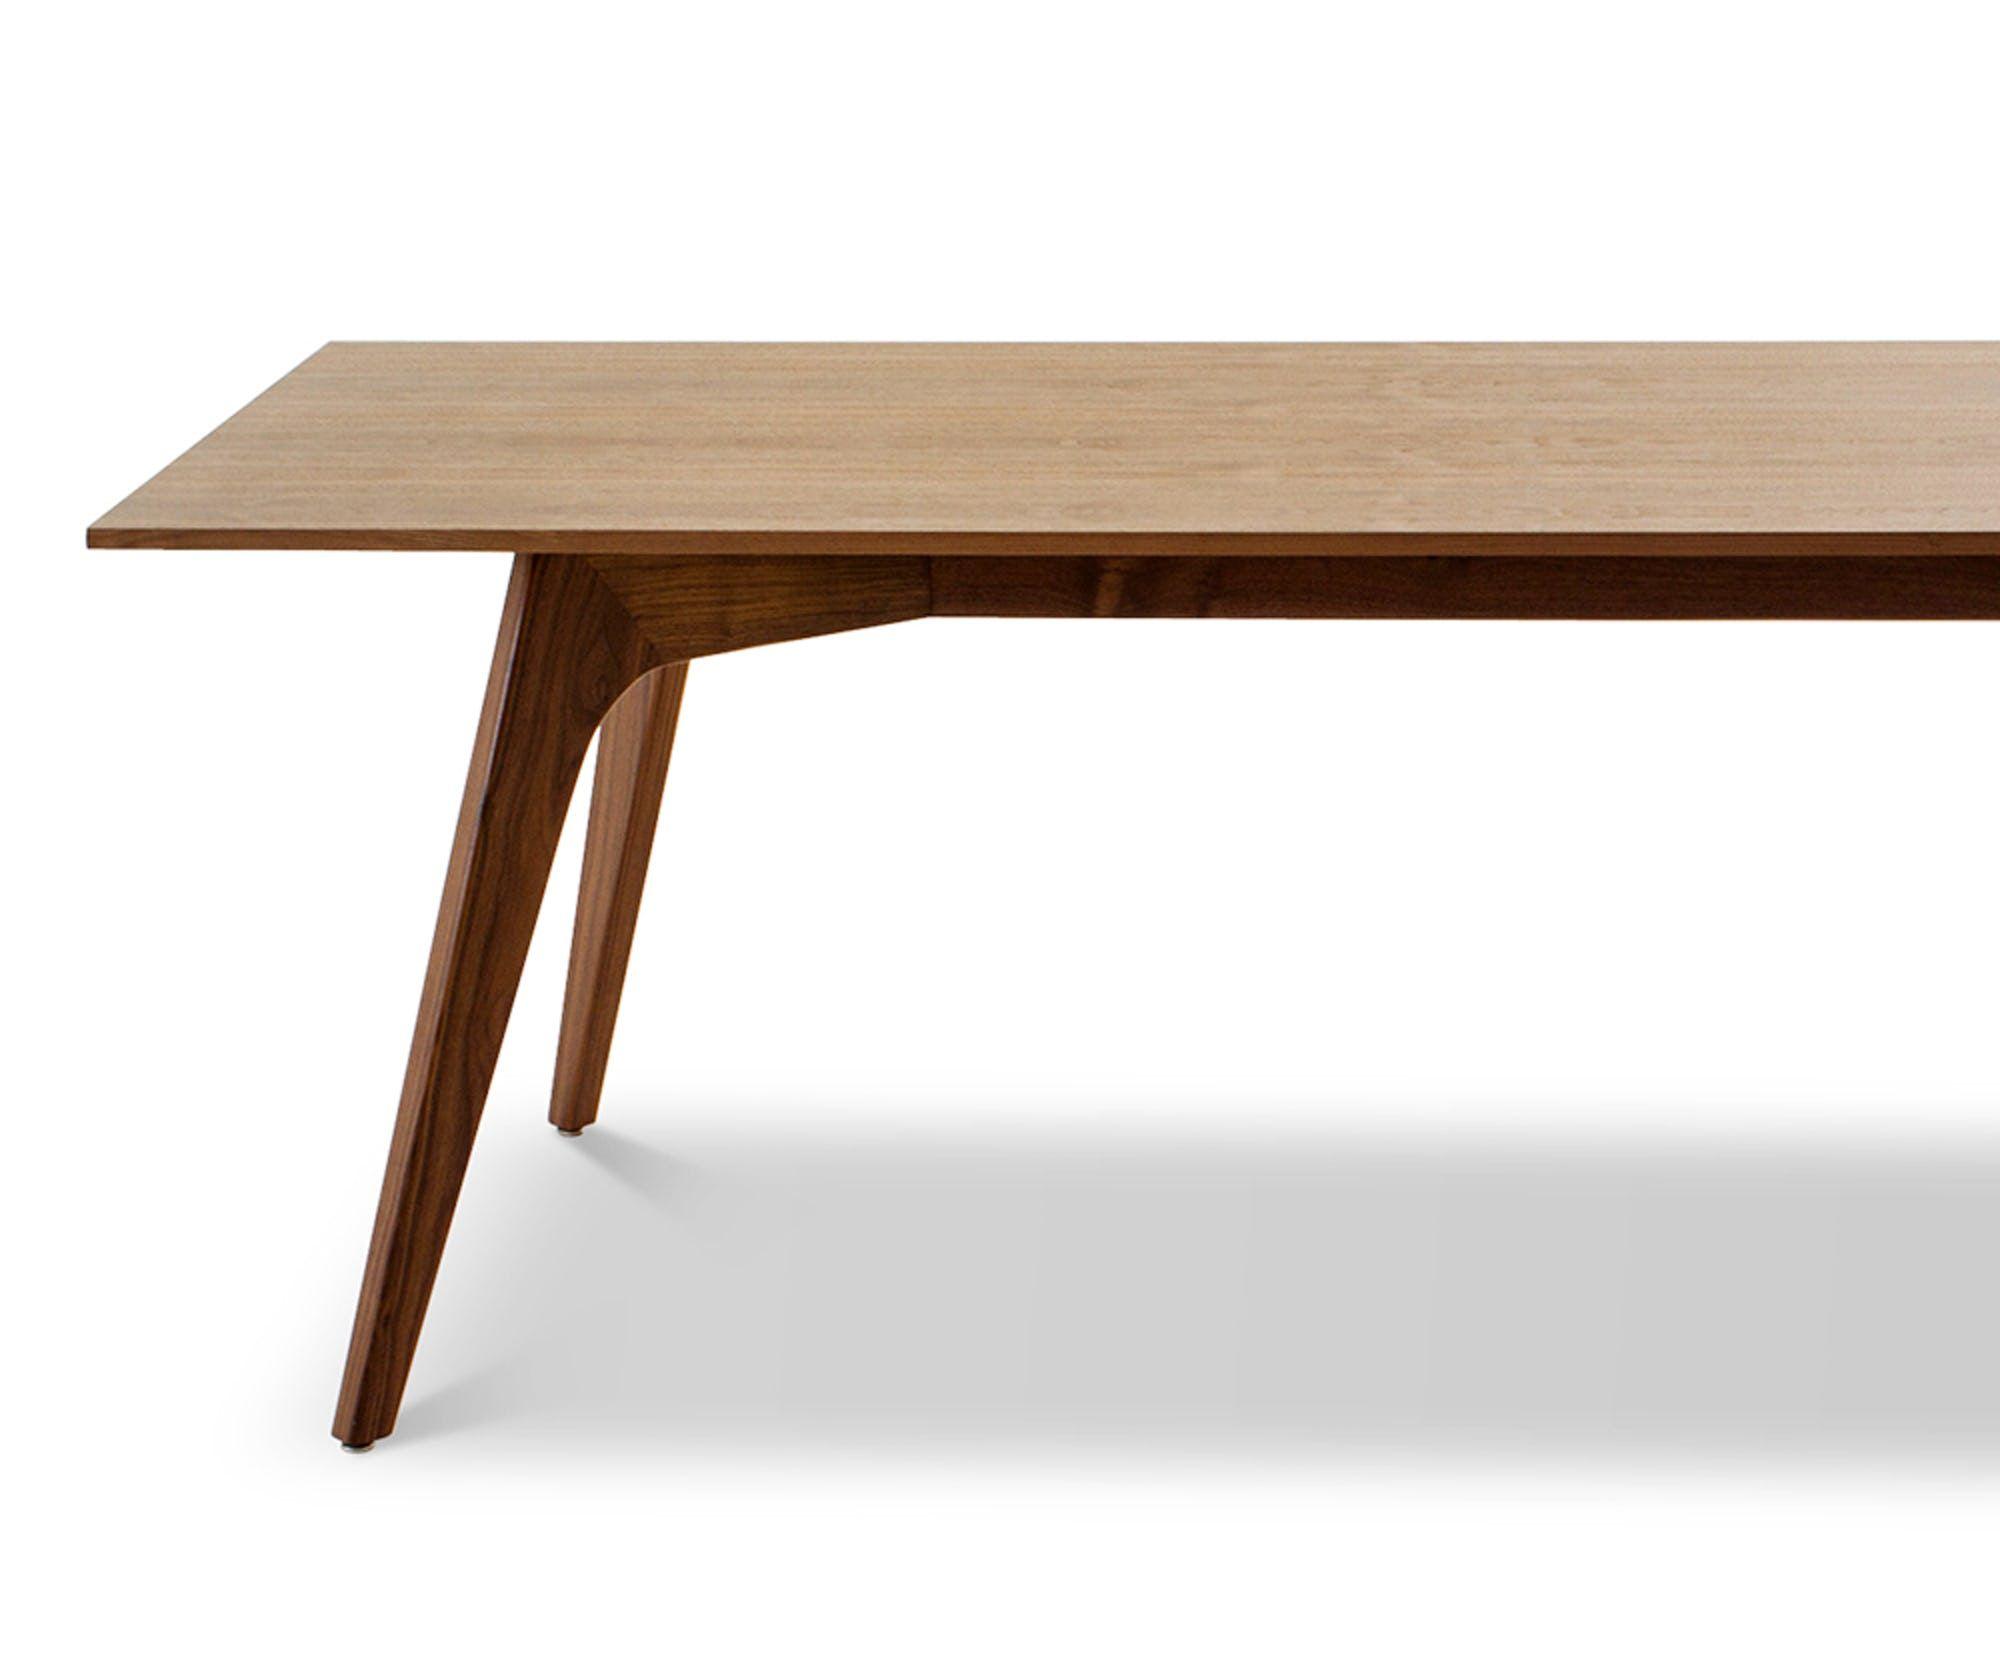 Hesse Wood Top Dining Table Joybird In 2020 Midcentury